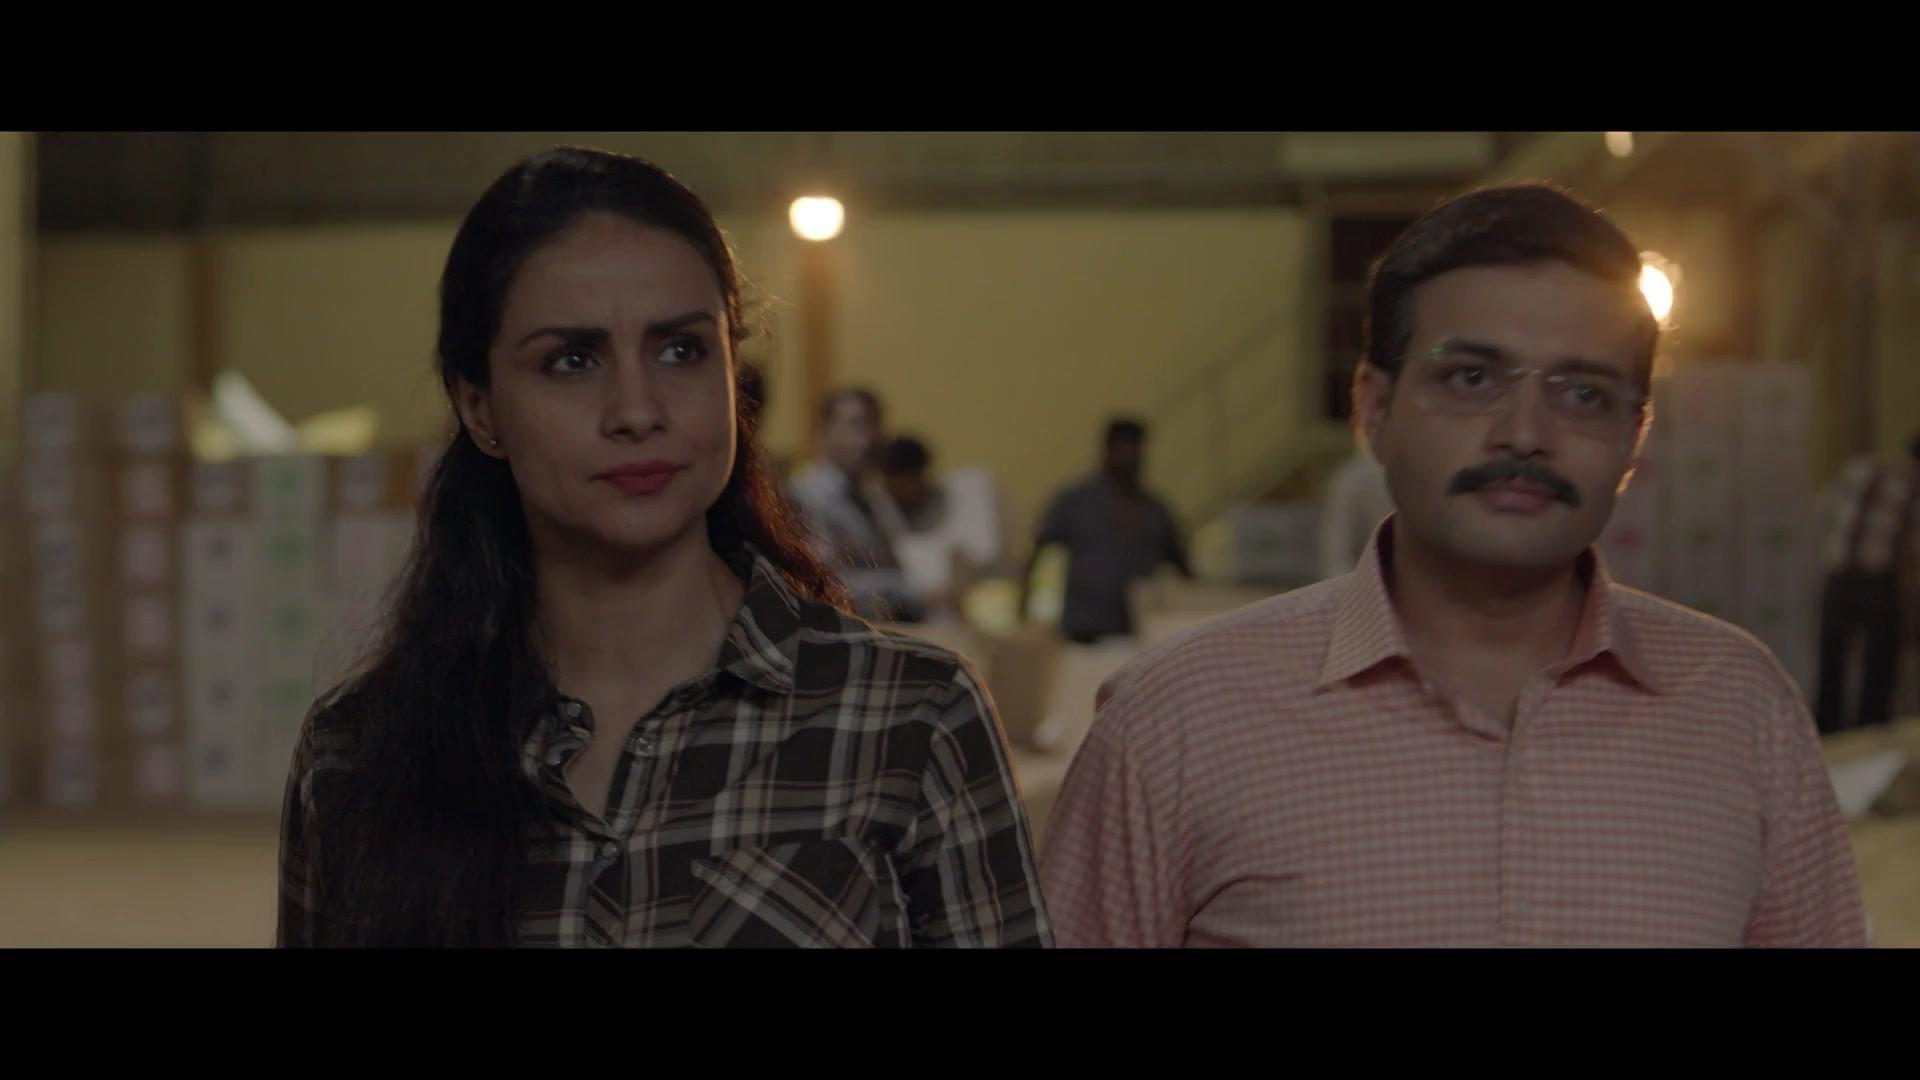 Rangbaaz Phir Se Season 02 Untouched 1080p WEB-DL AVC AAC ESUB - DusIcTv